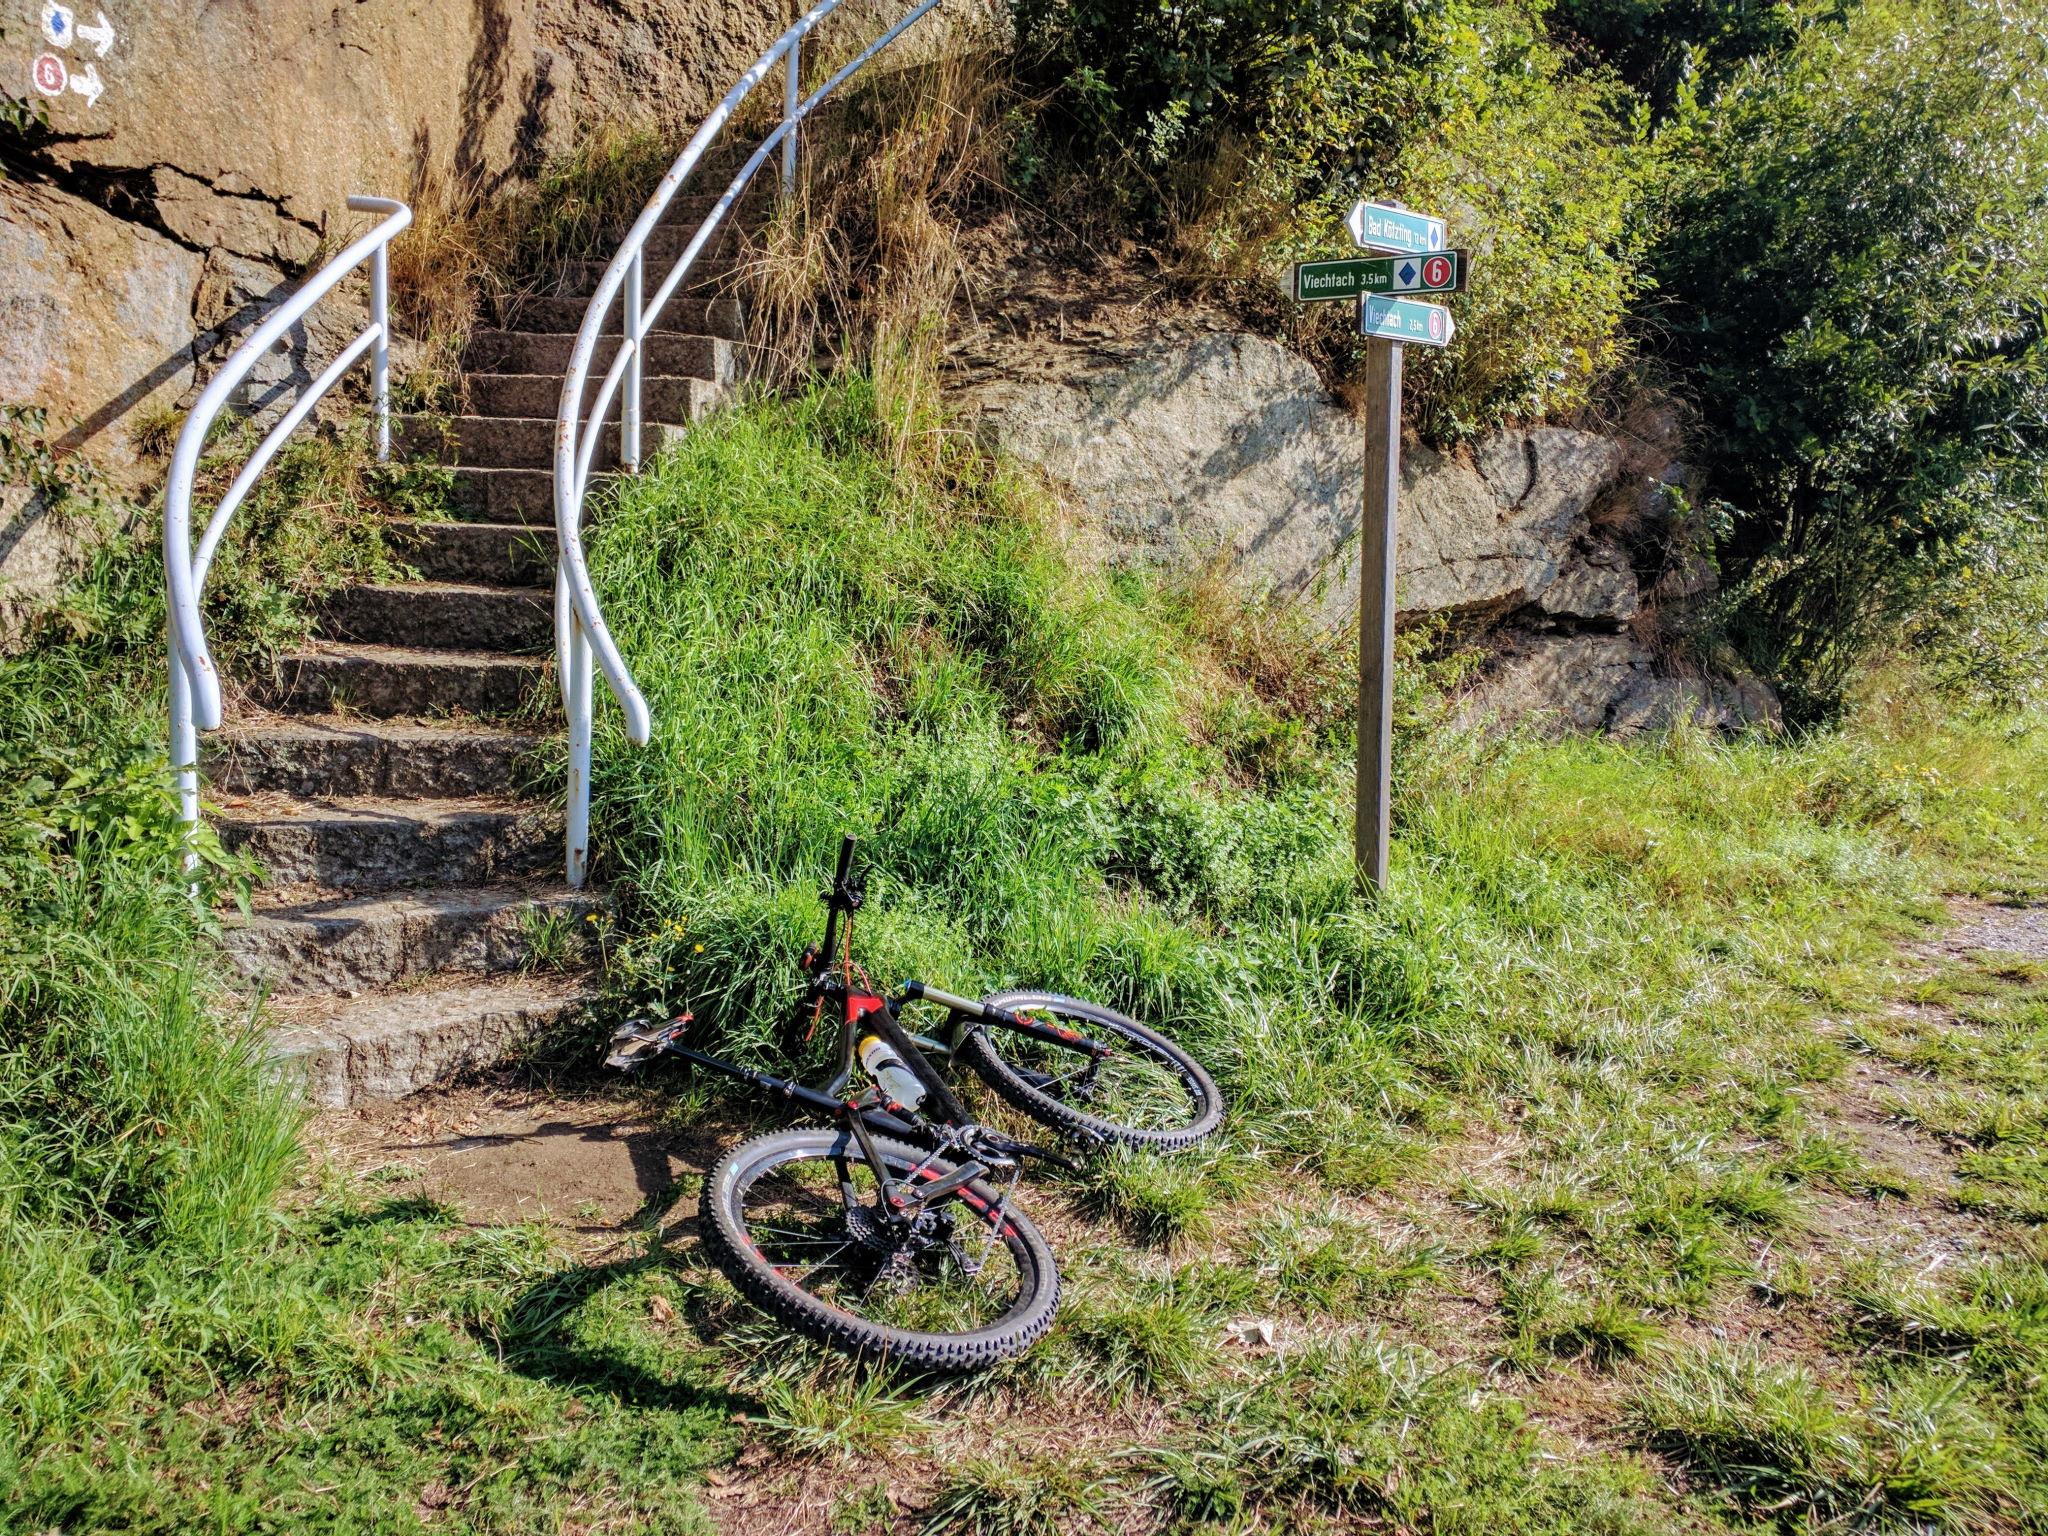 Treppe zum Beginn der 3. Etappe